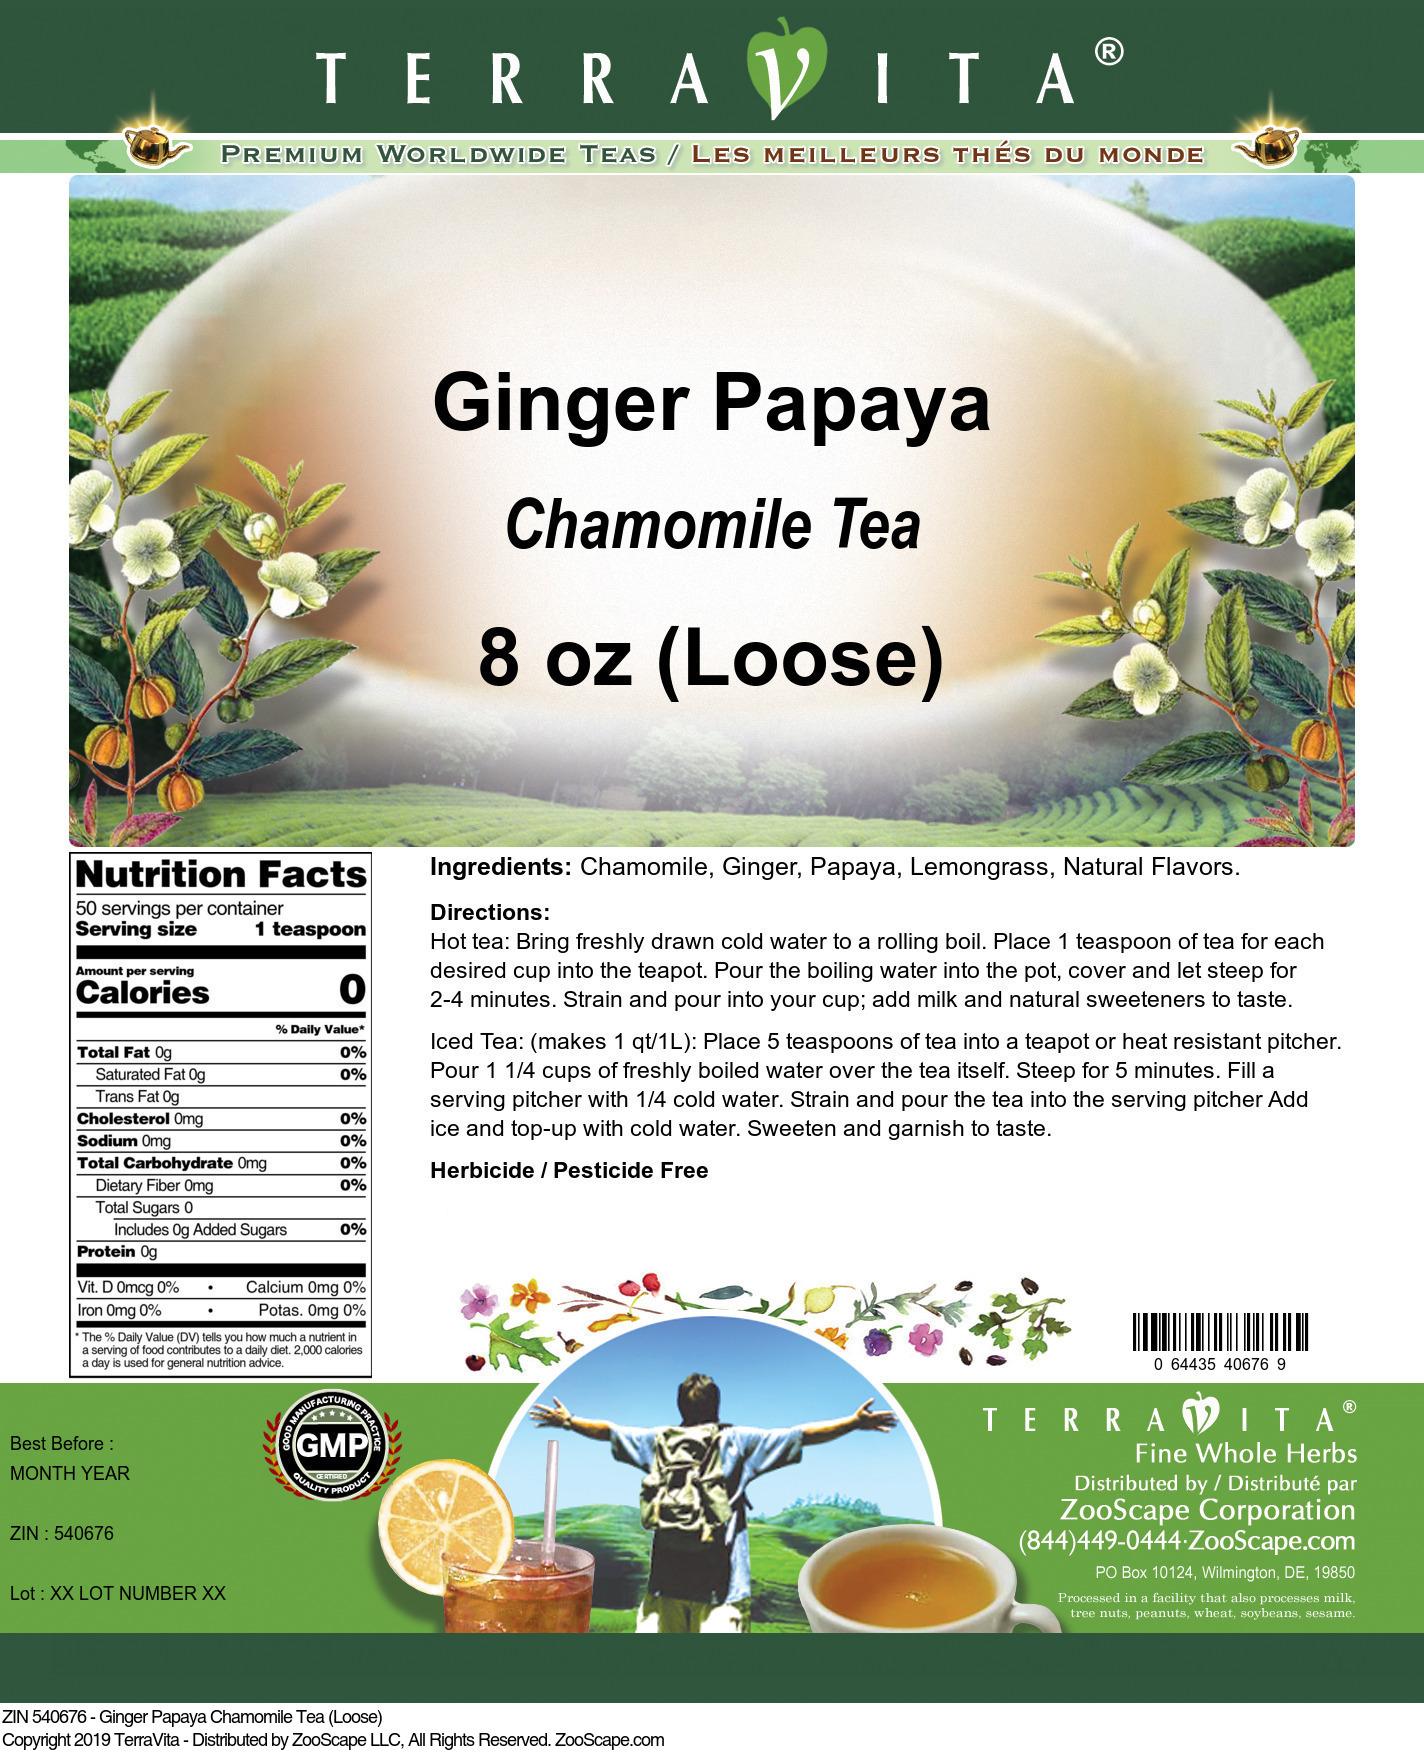 Ginger Papaya Chamomile Tea